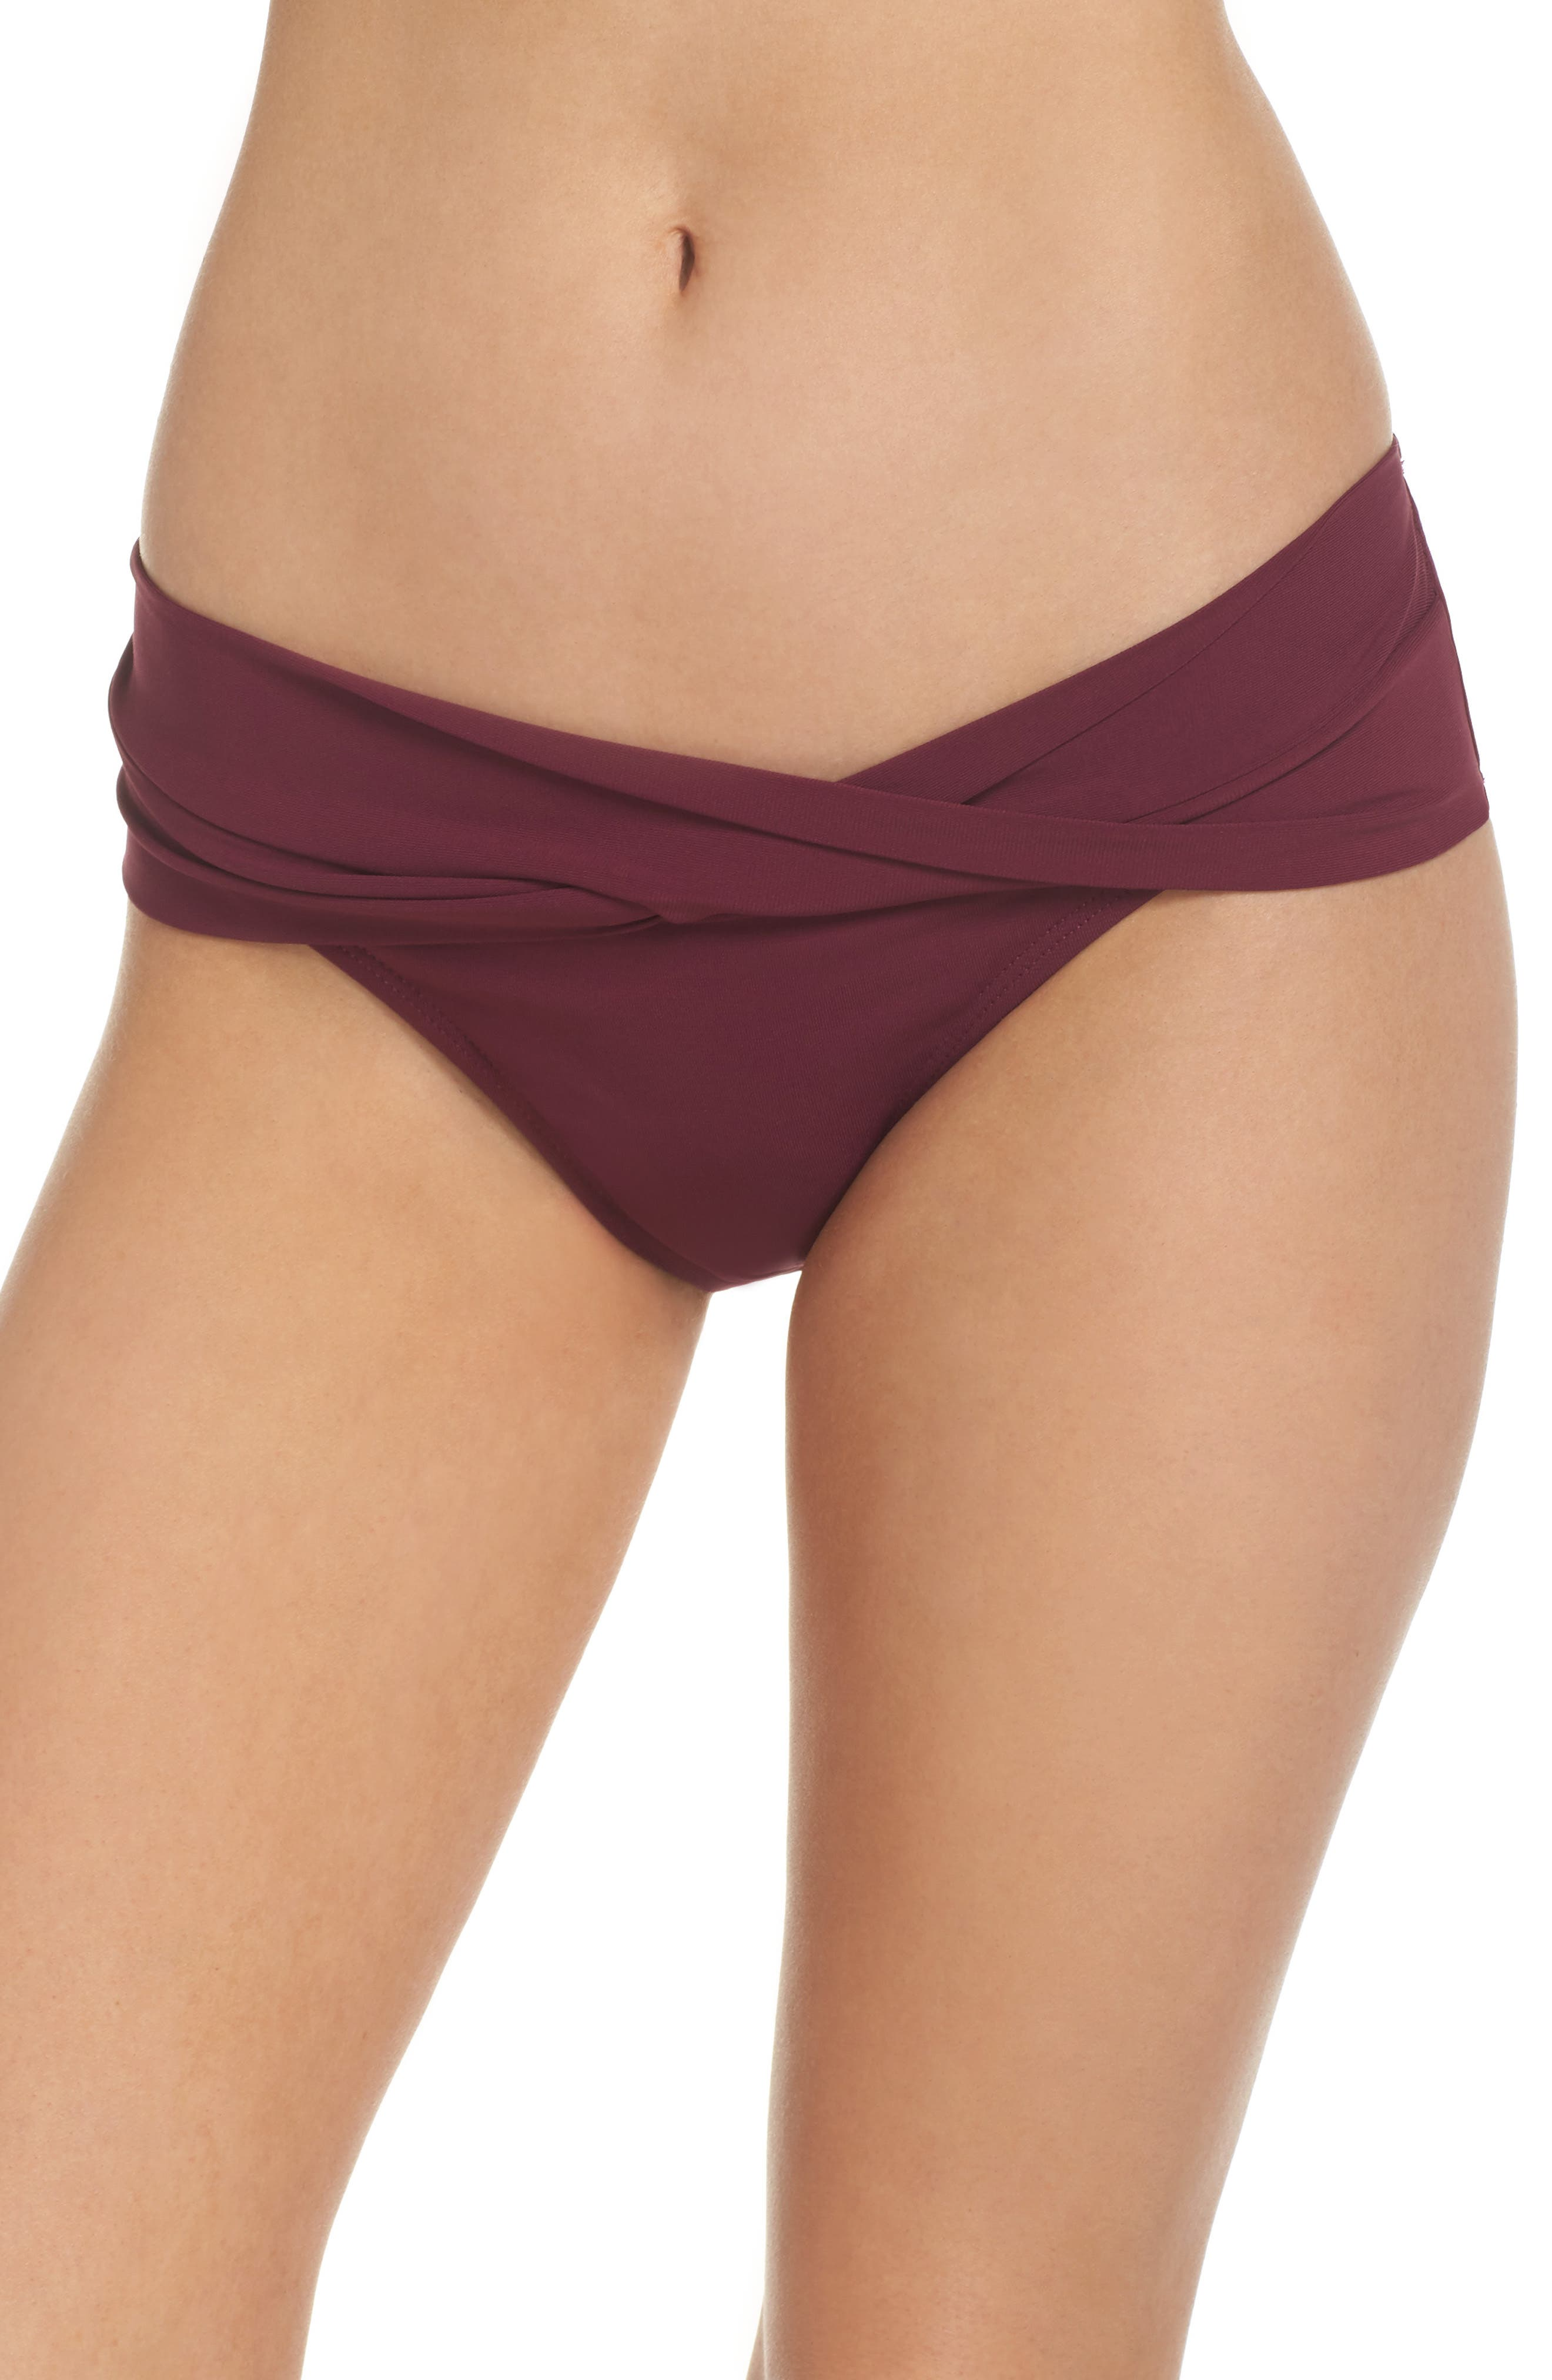 Ava Twist Hipster Bikini Bottoms,                         Main,                         color, 600